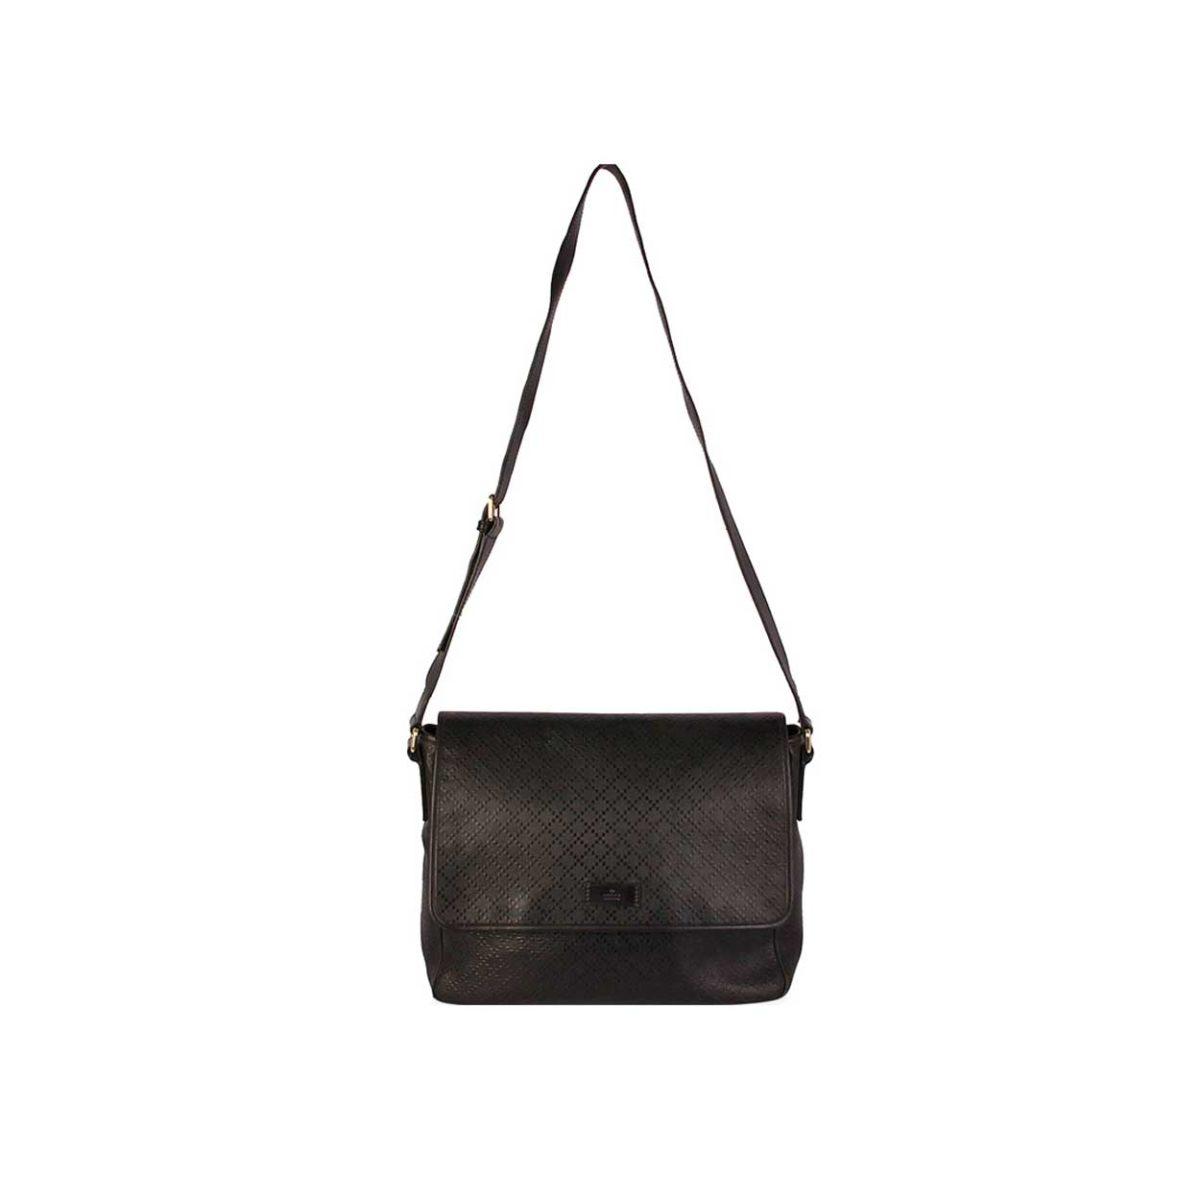 8759e06b277219 GUCCI Diamante Leather Messenger Bag Black | Luxity